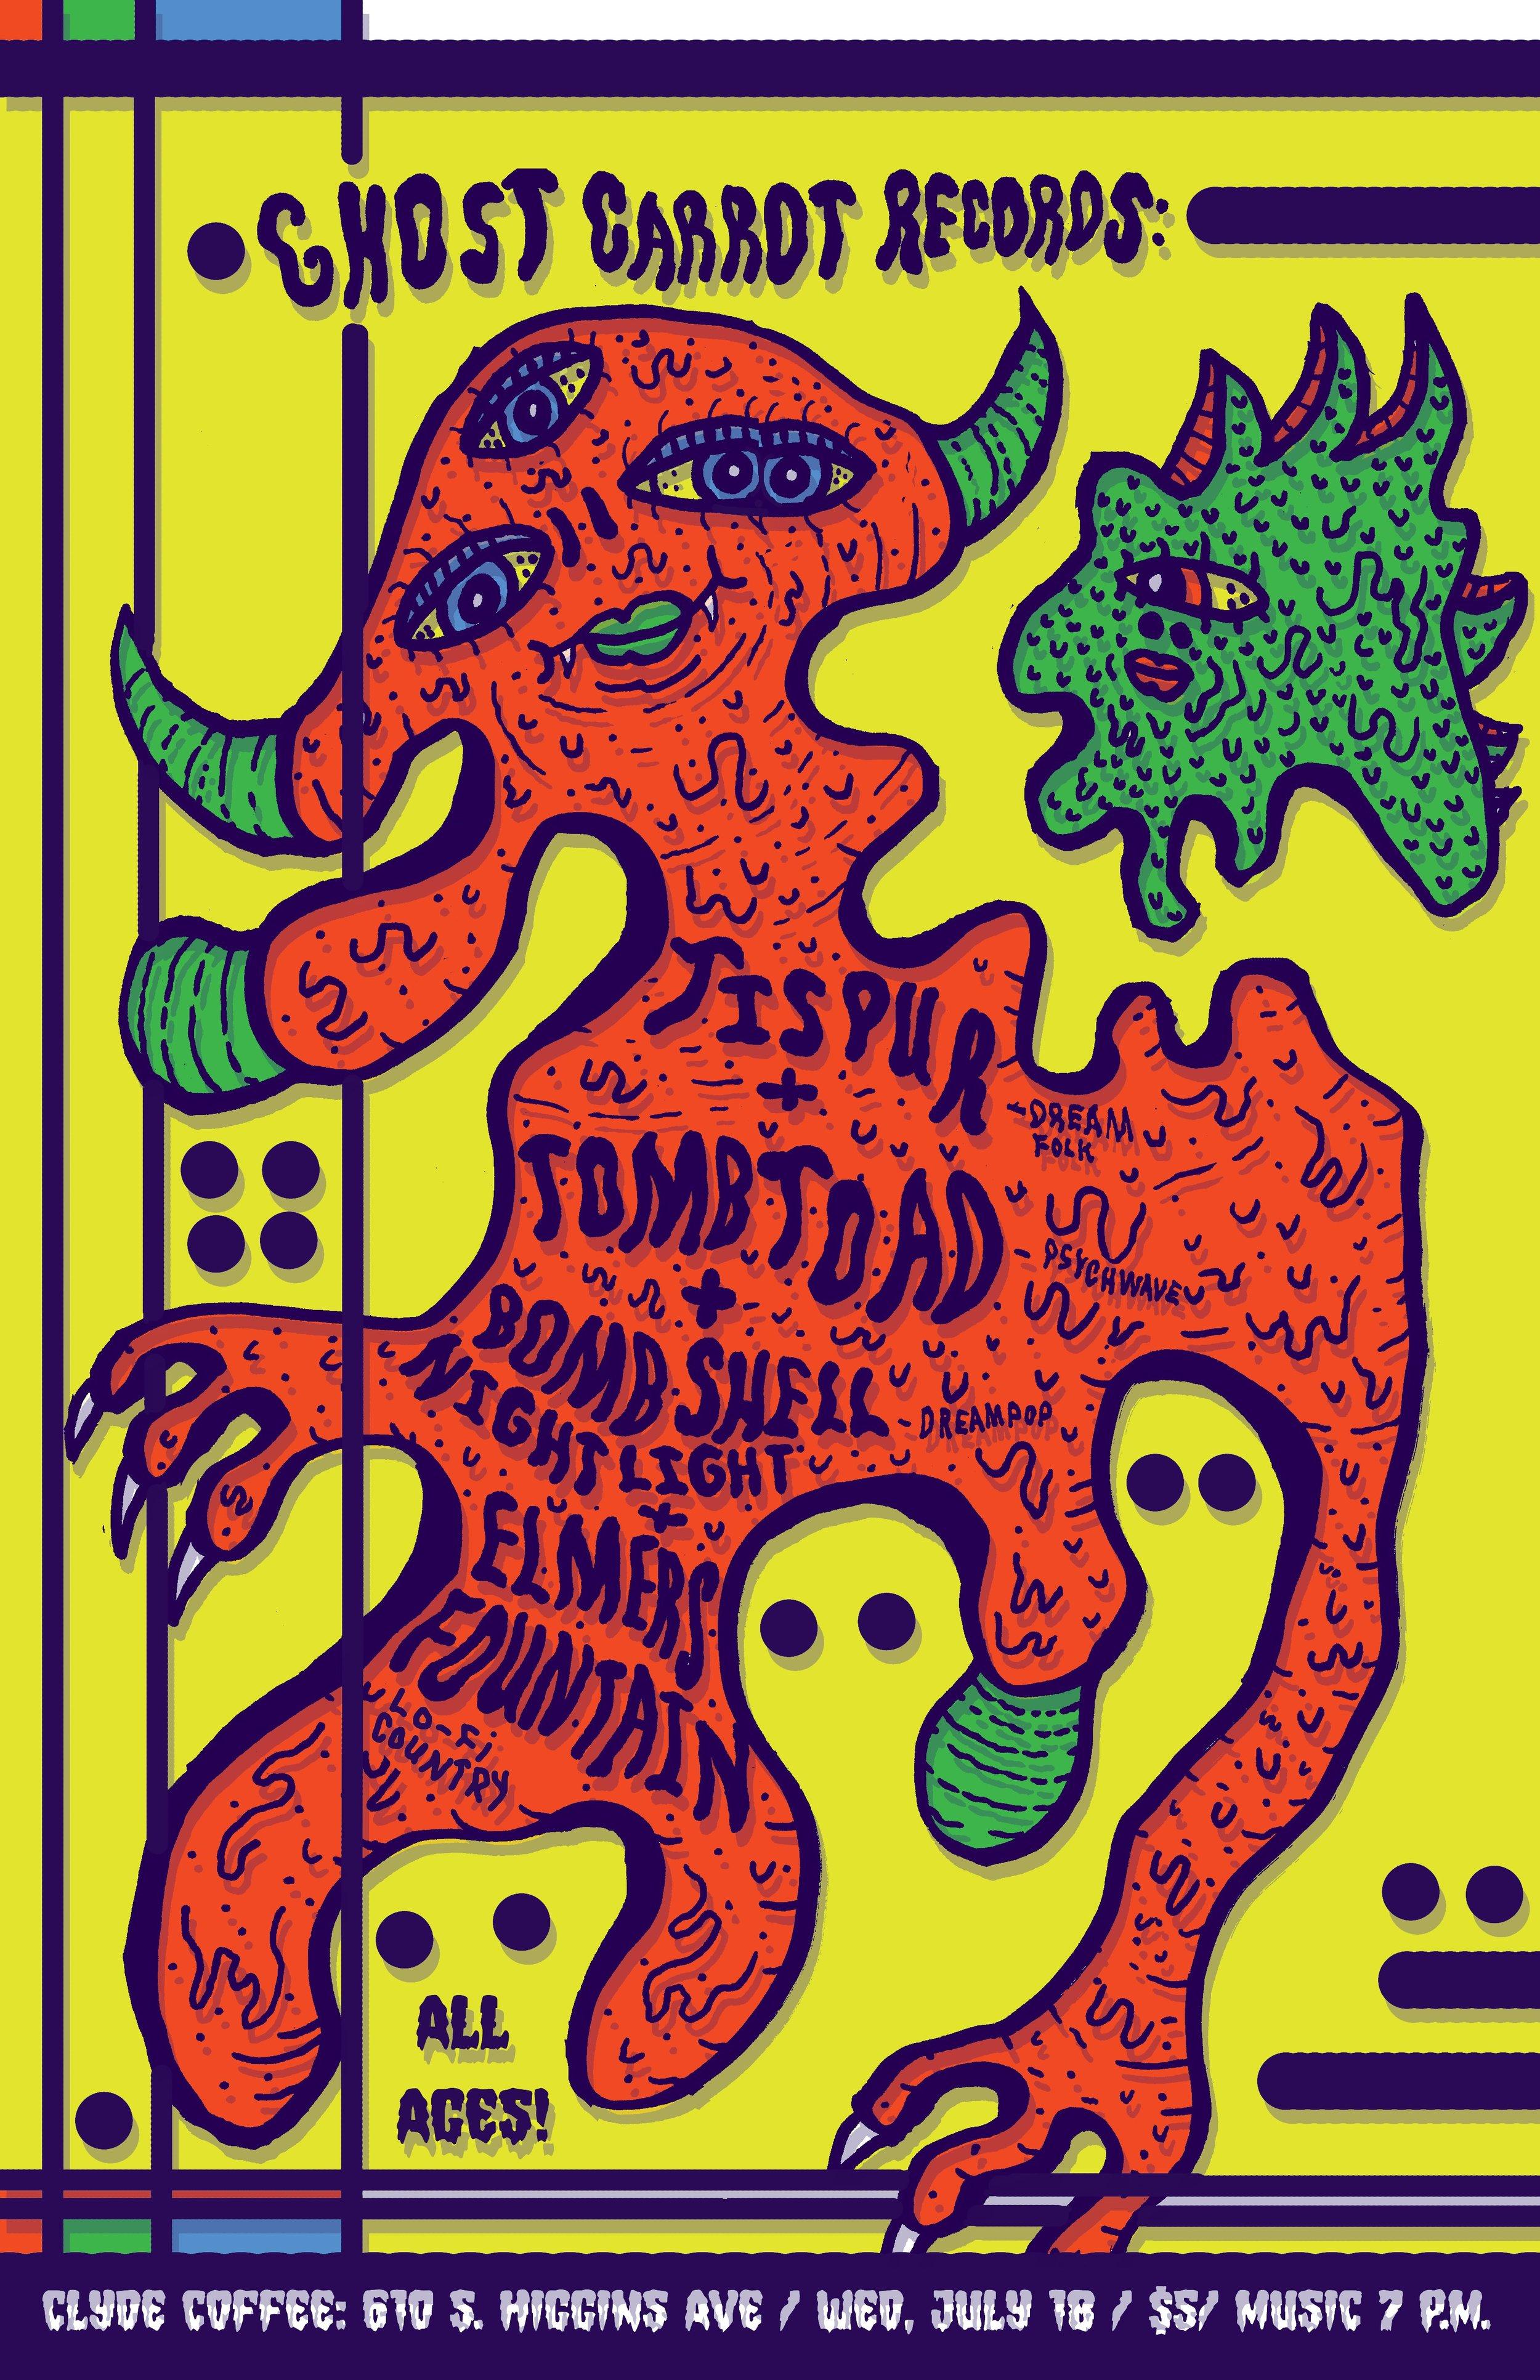 Tispur show flyer copy.jpg